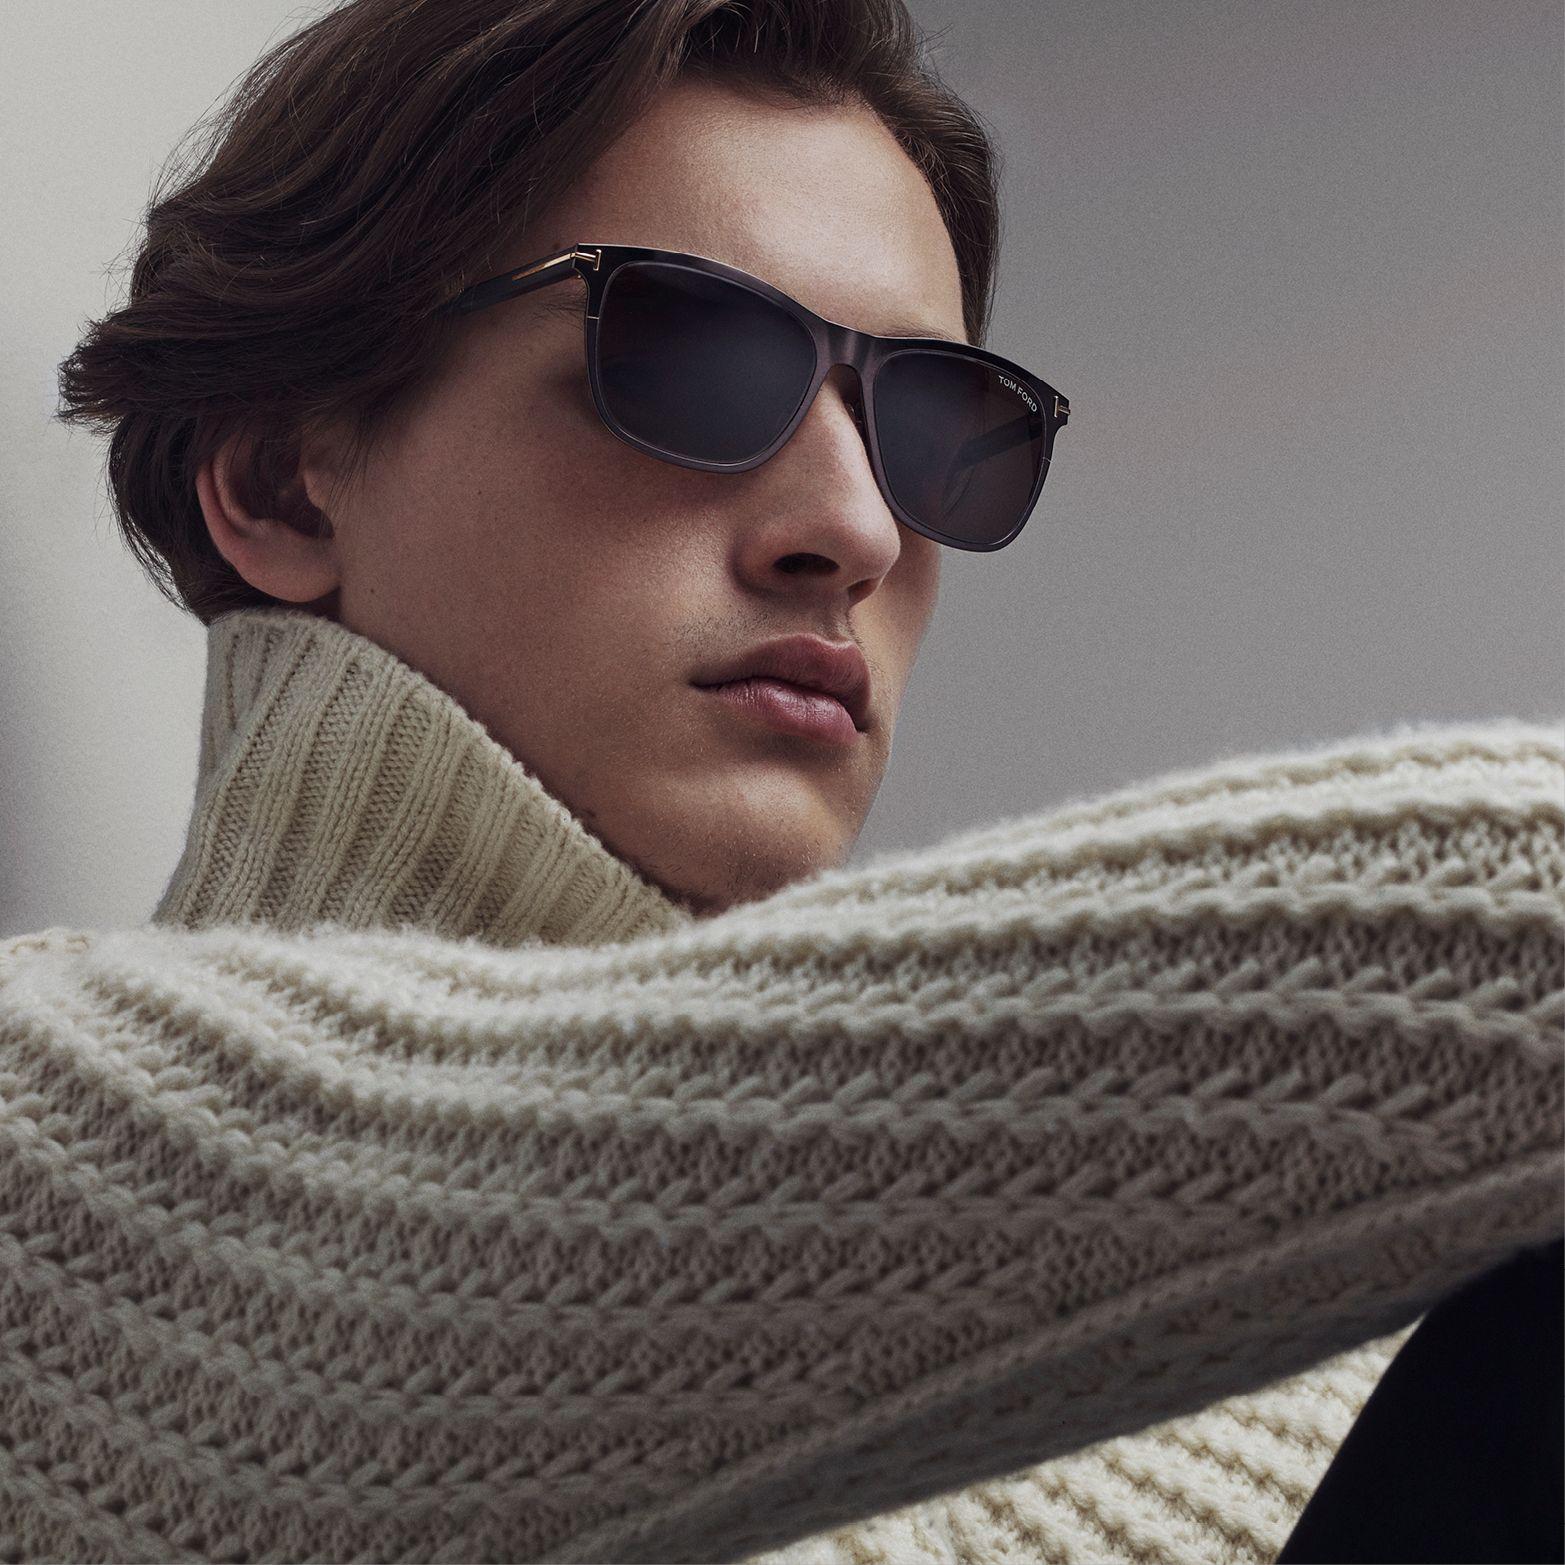 a690a29e5cf2 Alasdhair sunglasses | TOM FORD EYEWEAR | Men sunglasses fashion ...